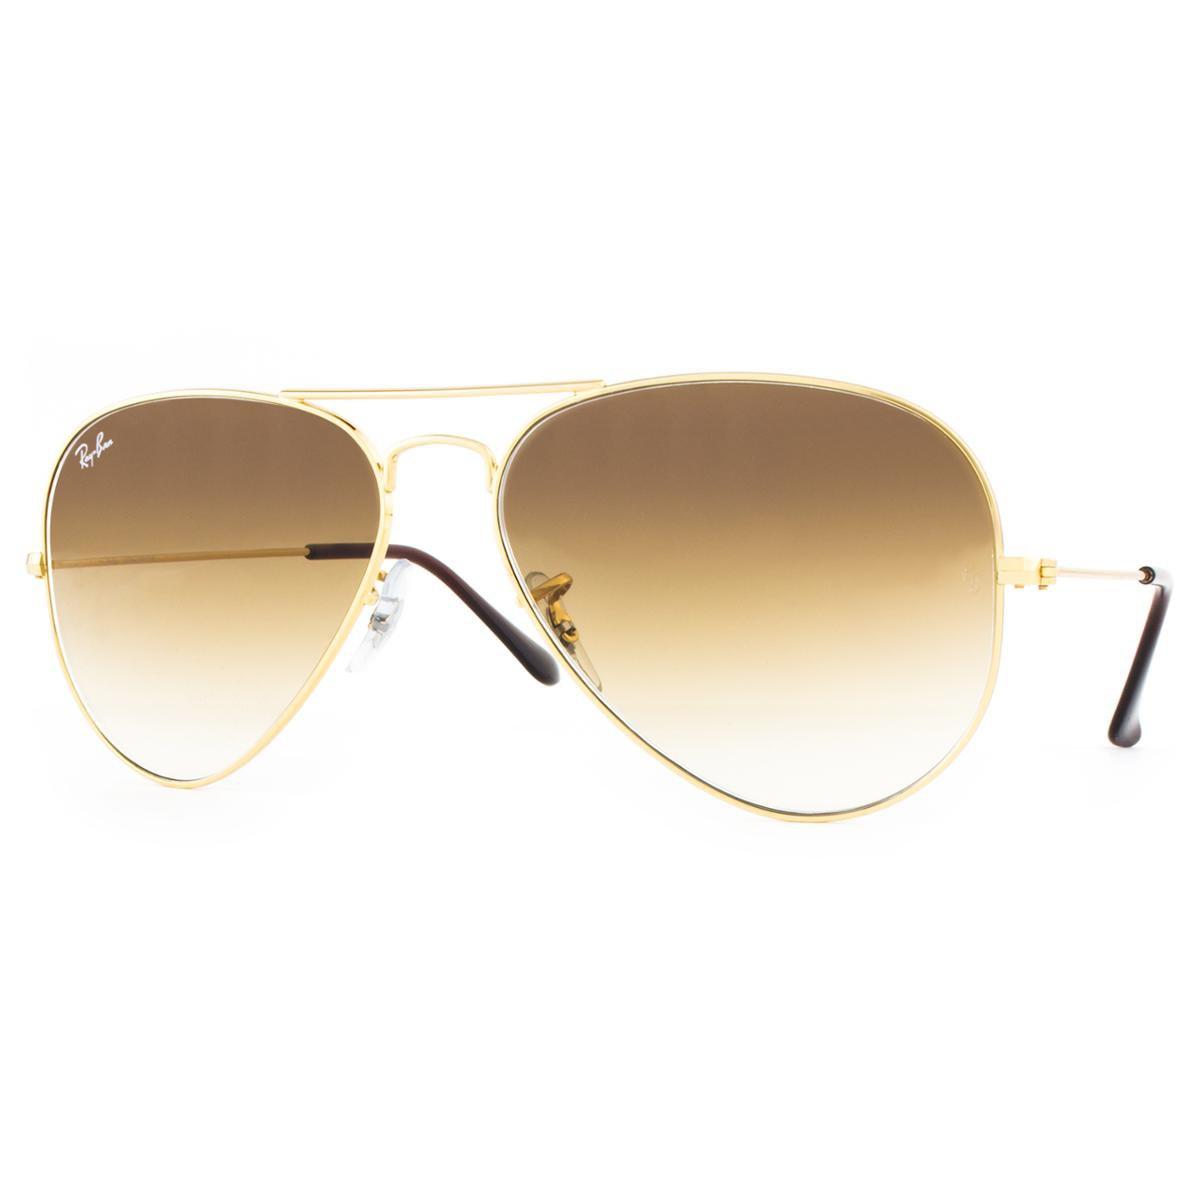 24164203a50d1 Óculos de Sol Ray Ban Aviator RB3025L 001 51-58 Feminino - Dourado ...